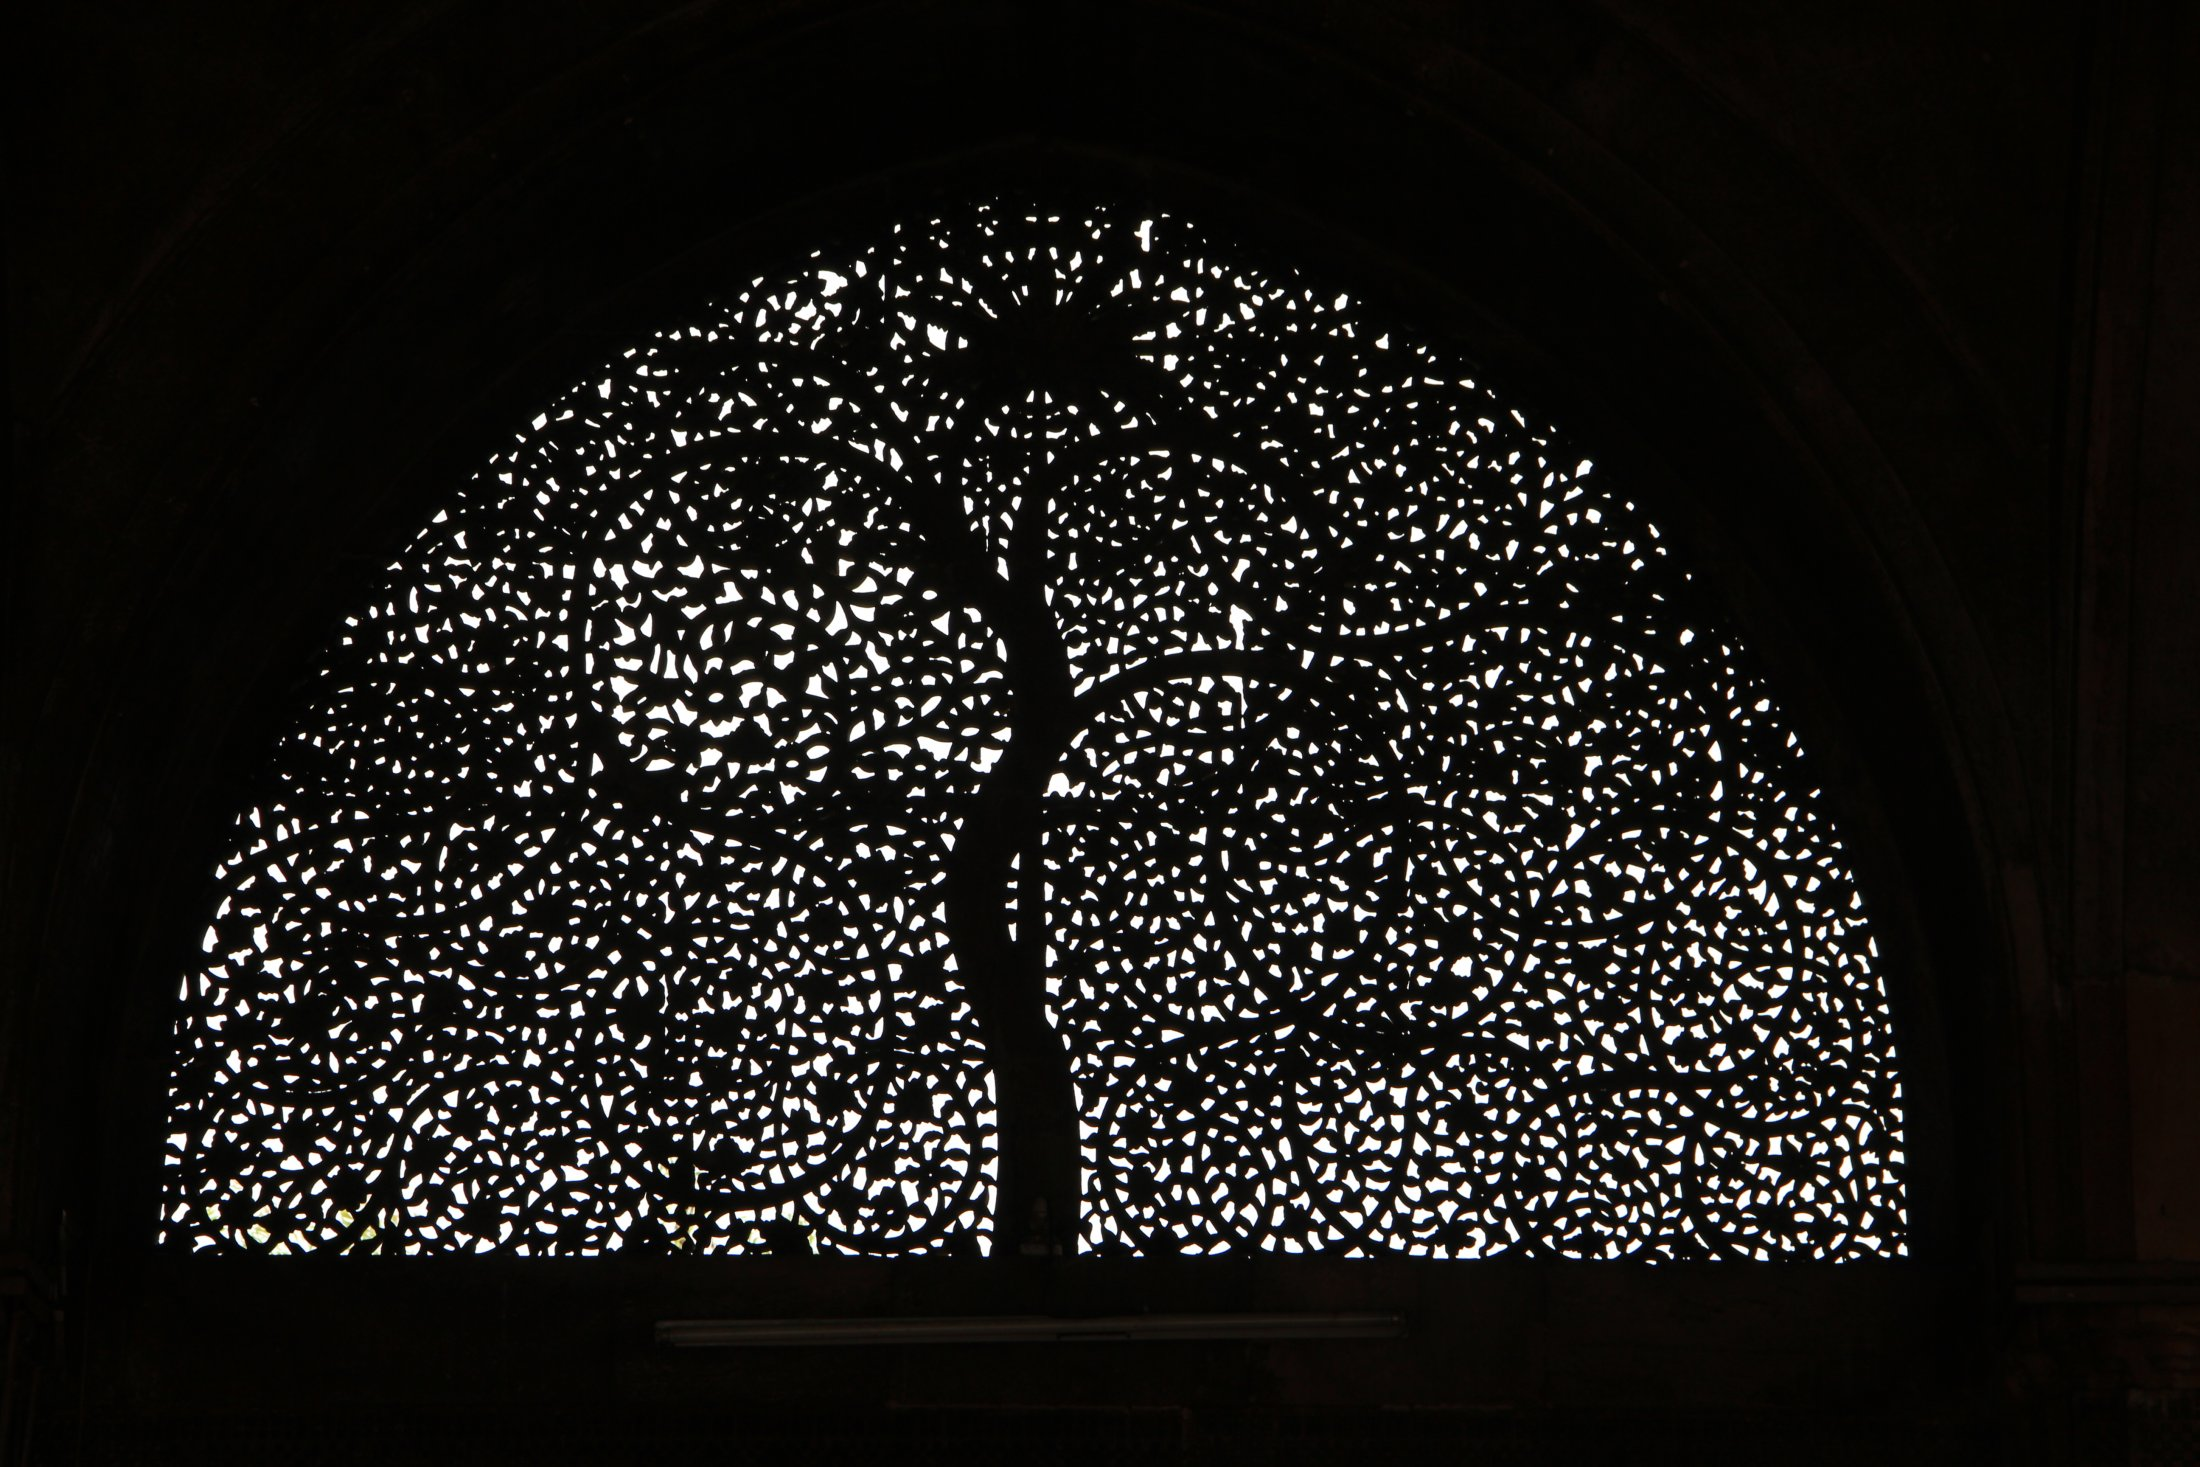 Tree of Life, Sidi Sayed Mosque